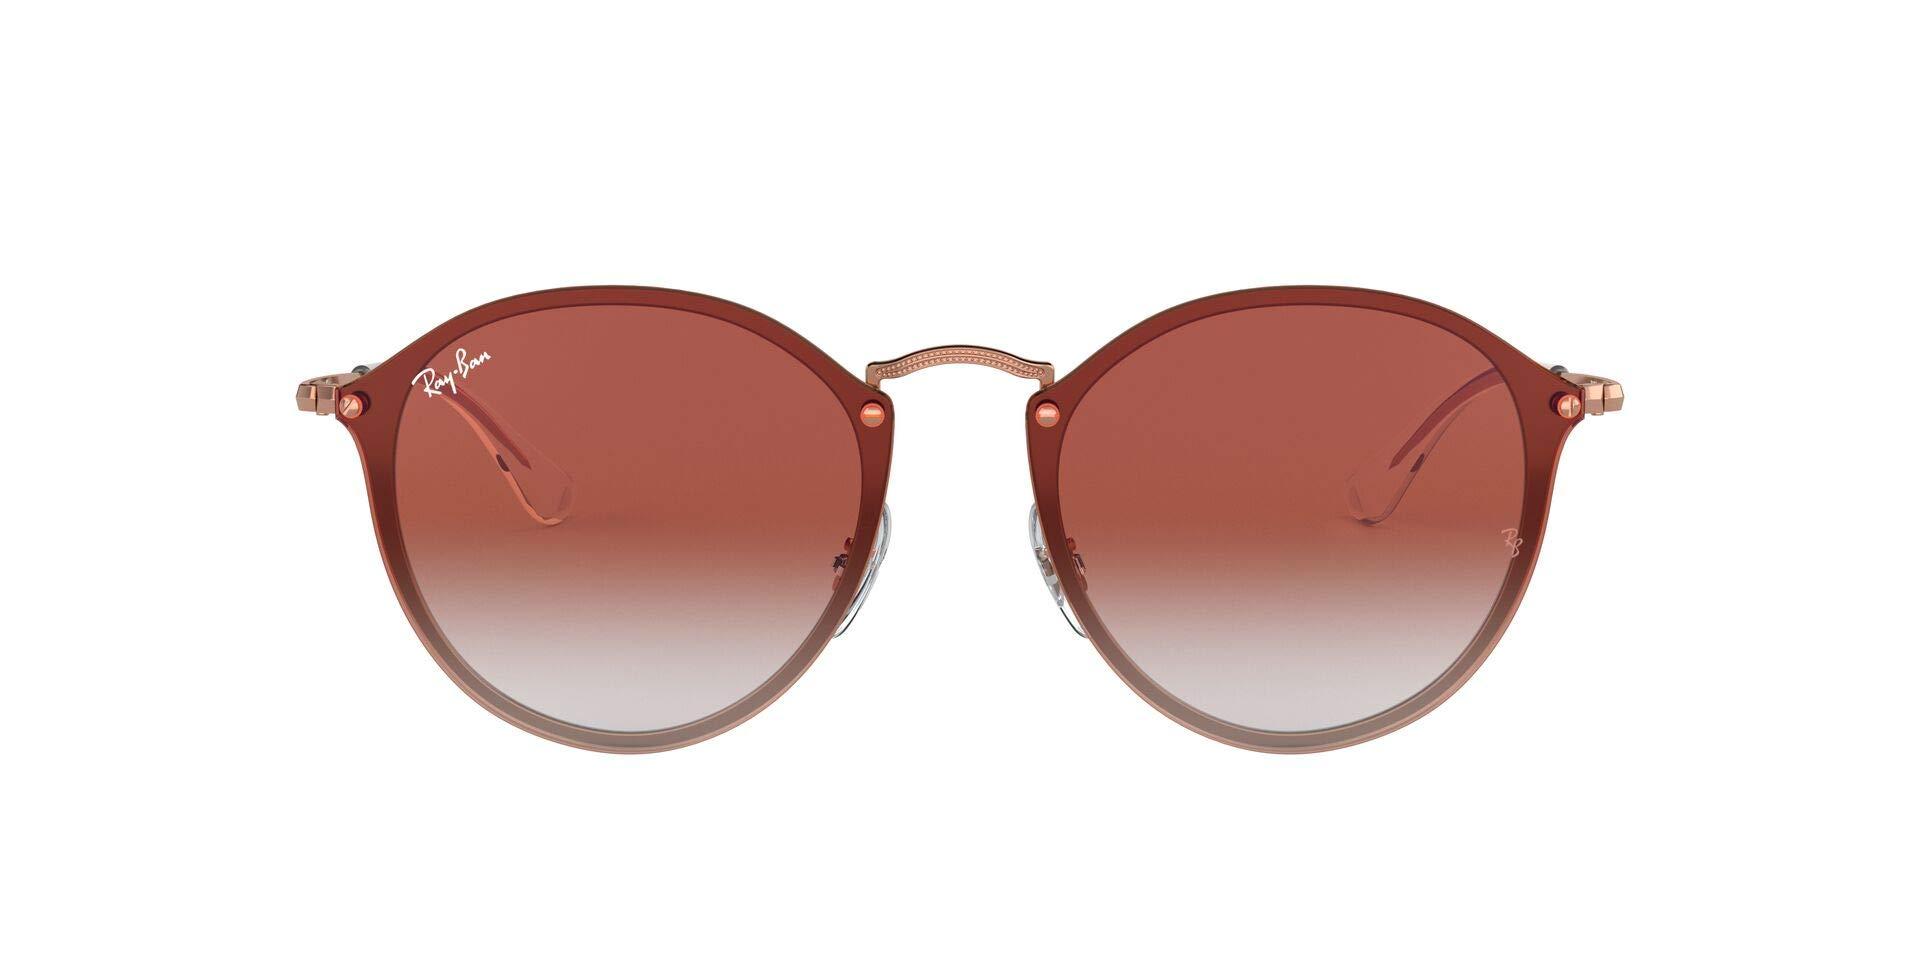 Ray-Ban Rb3574n Blaze Round Sunglasses